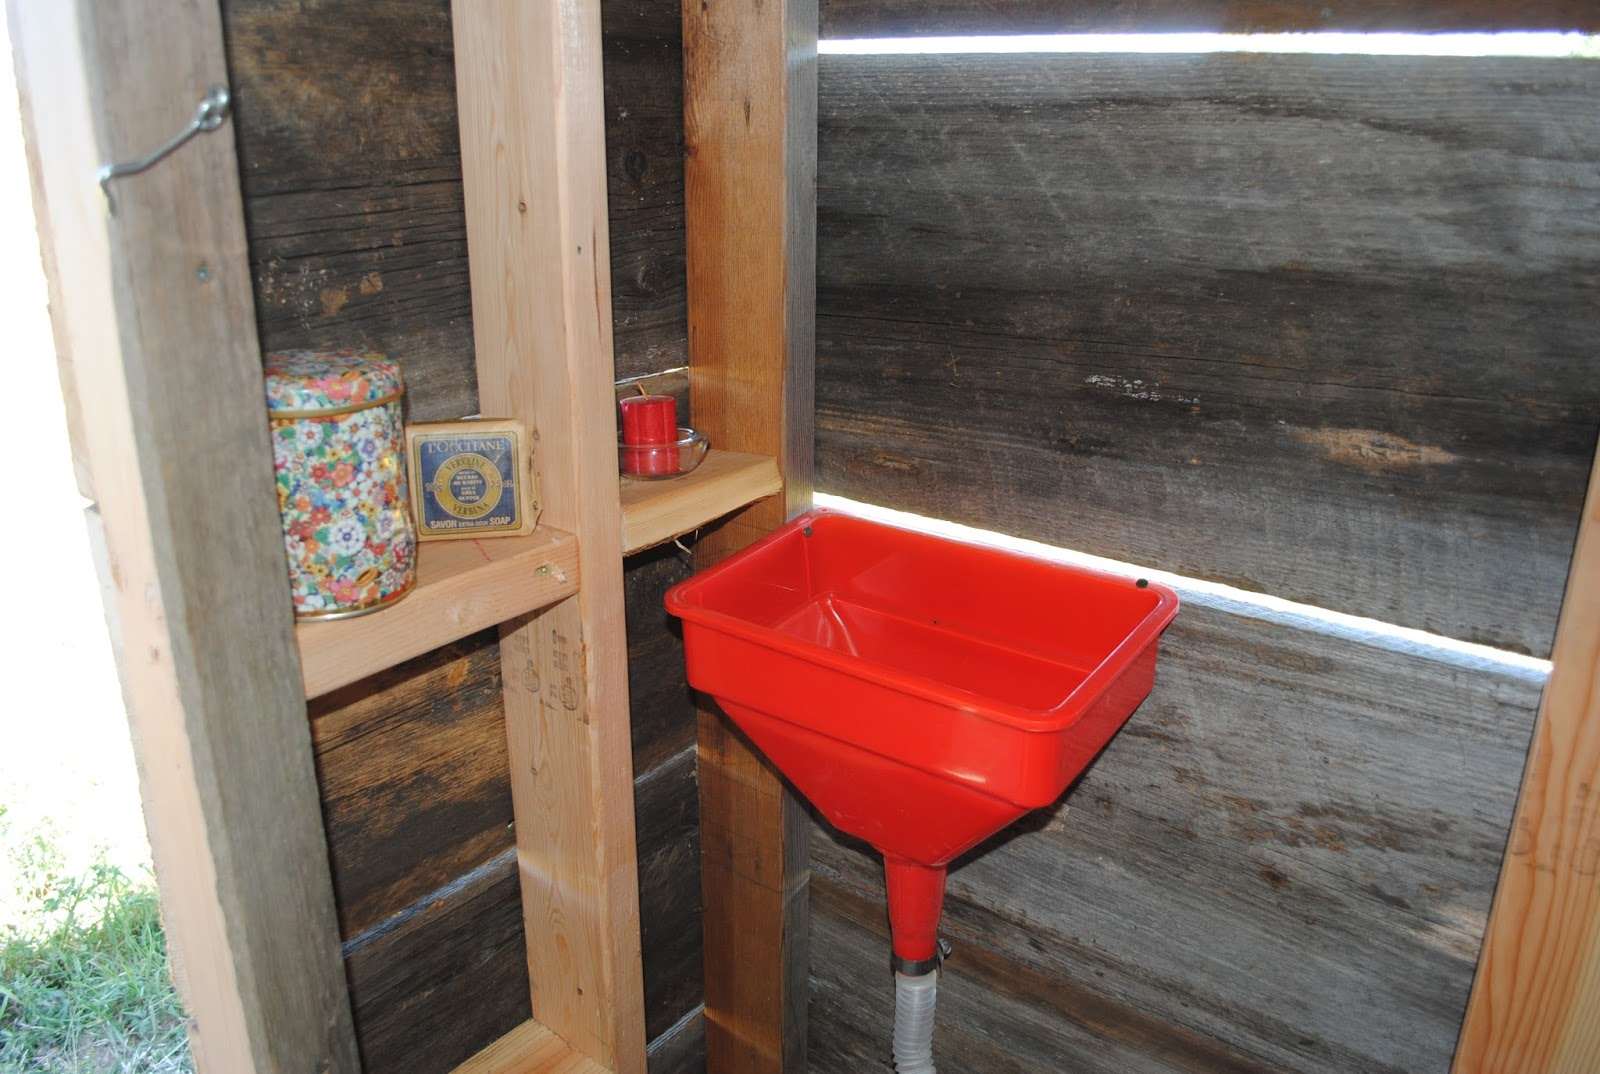 Homemade Urinal Operation18 Truckers Social Media